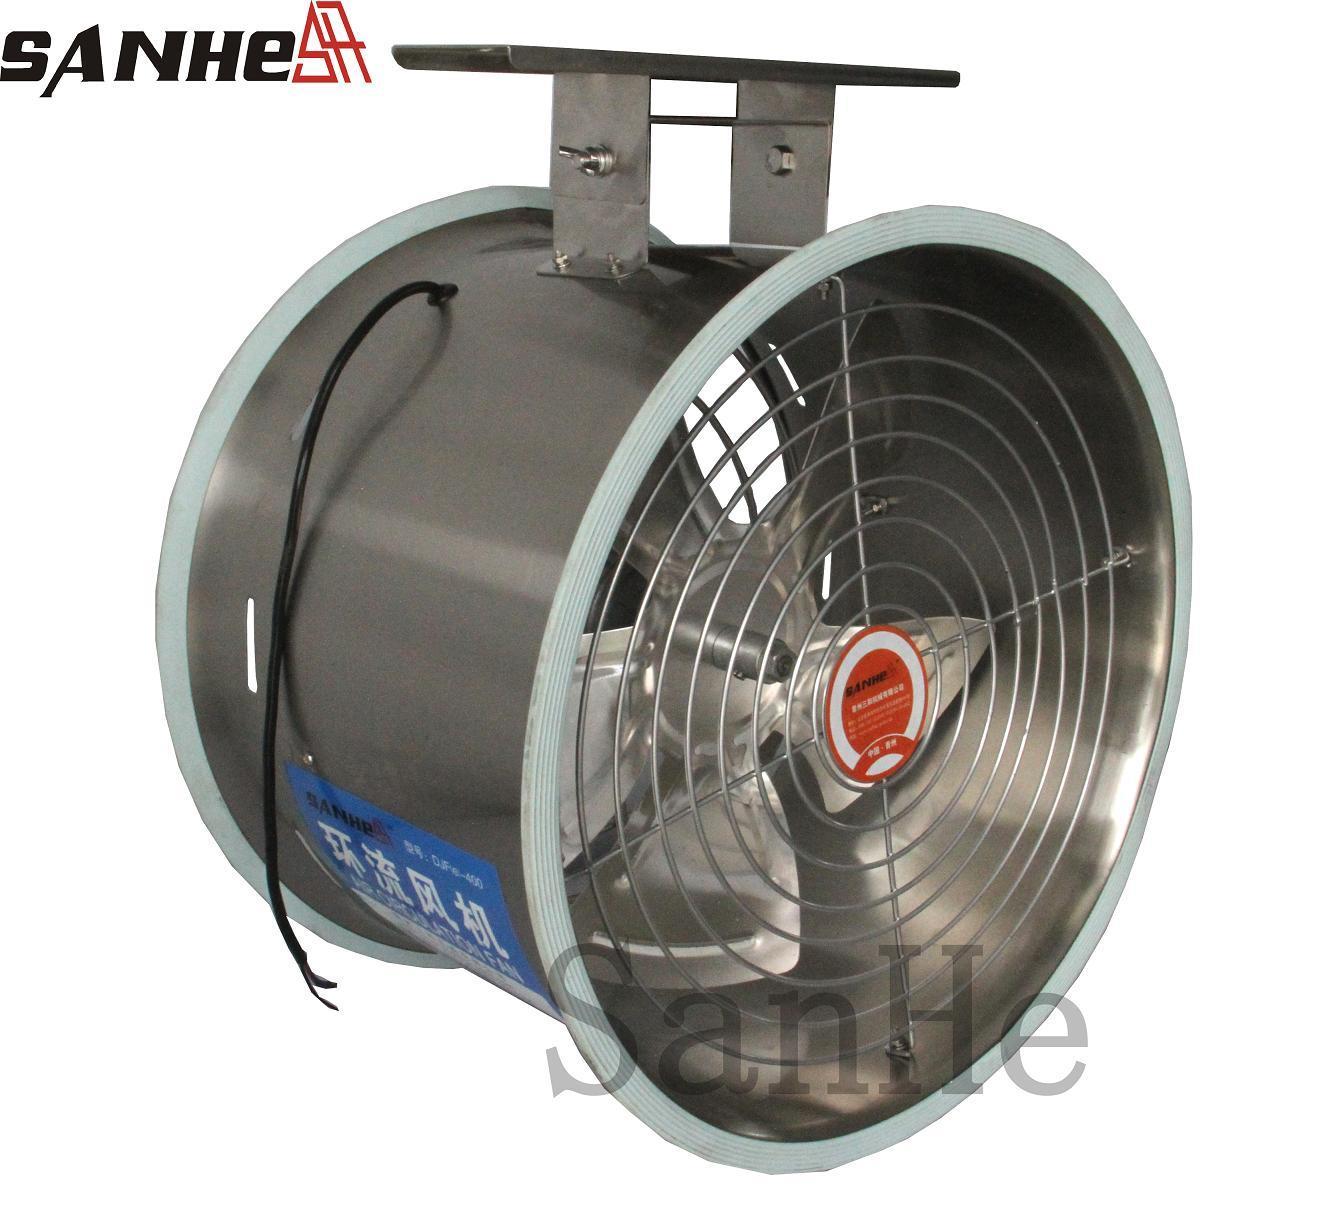 Greenhouse Air Circulation : Air circulation fan circular ventilation used dans